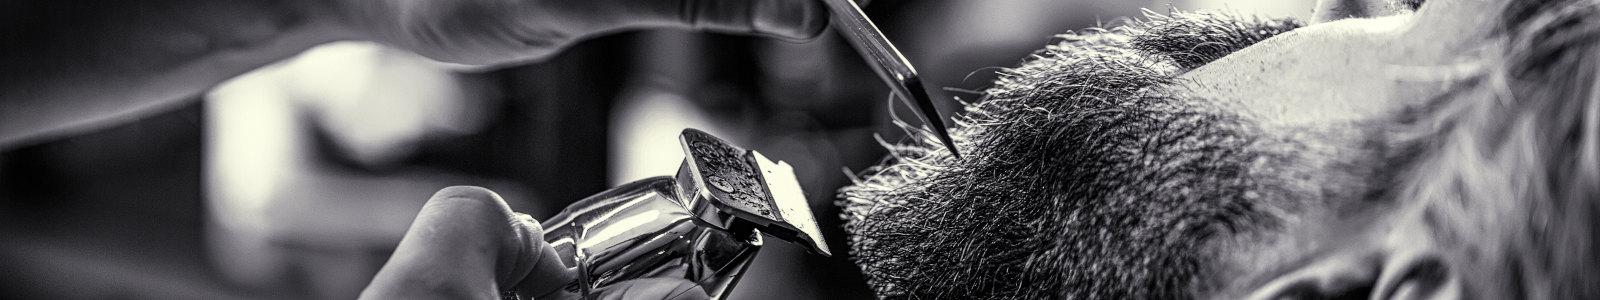 barber show